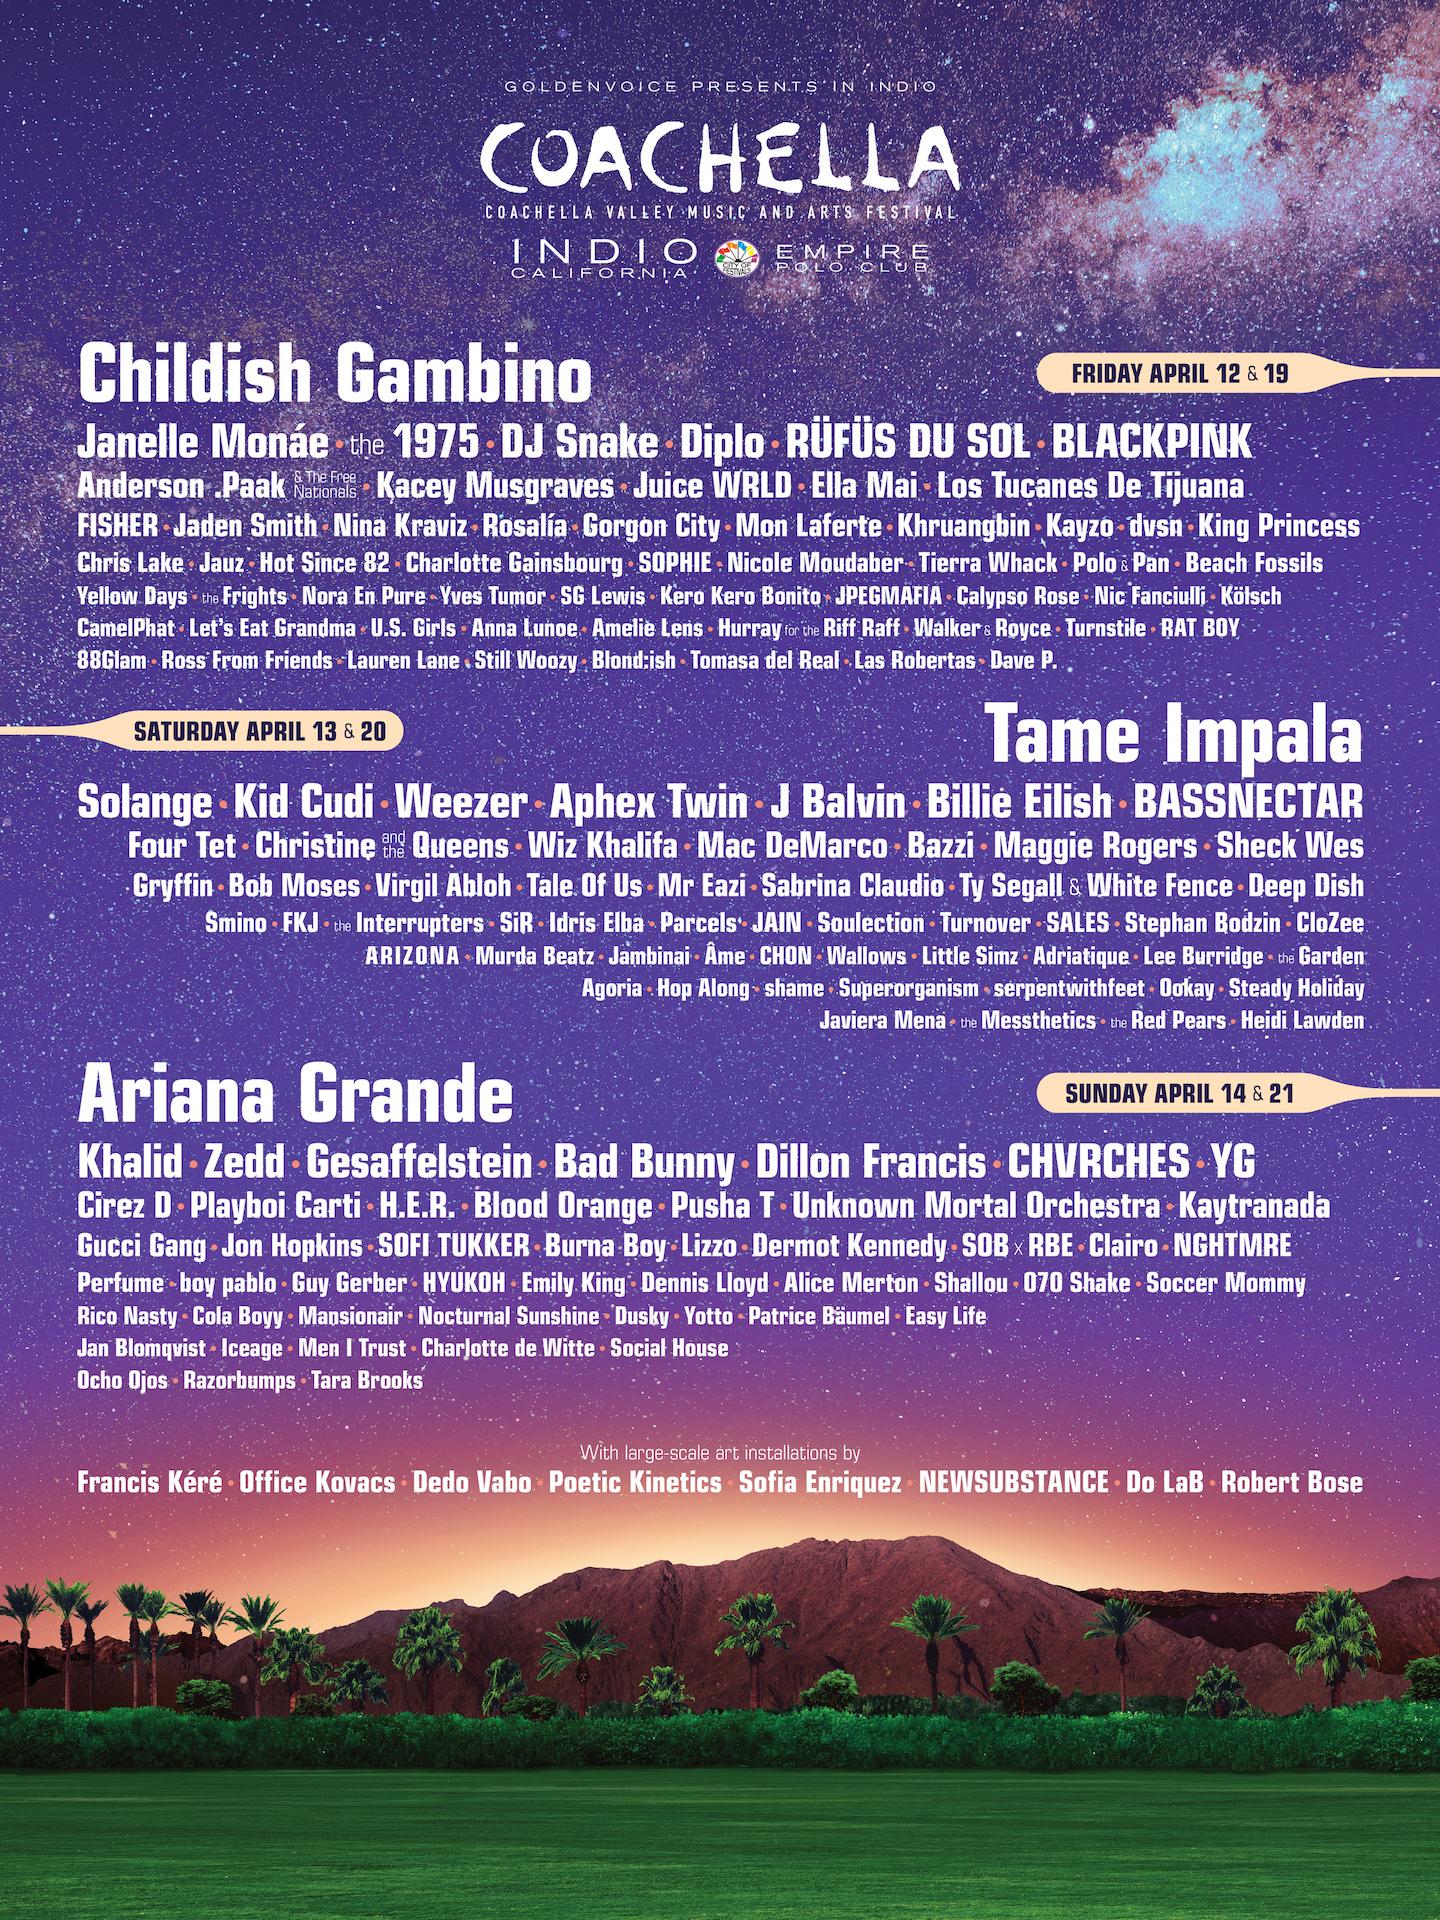 CATCH US AT… - Coachella Weekend 2!